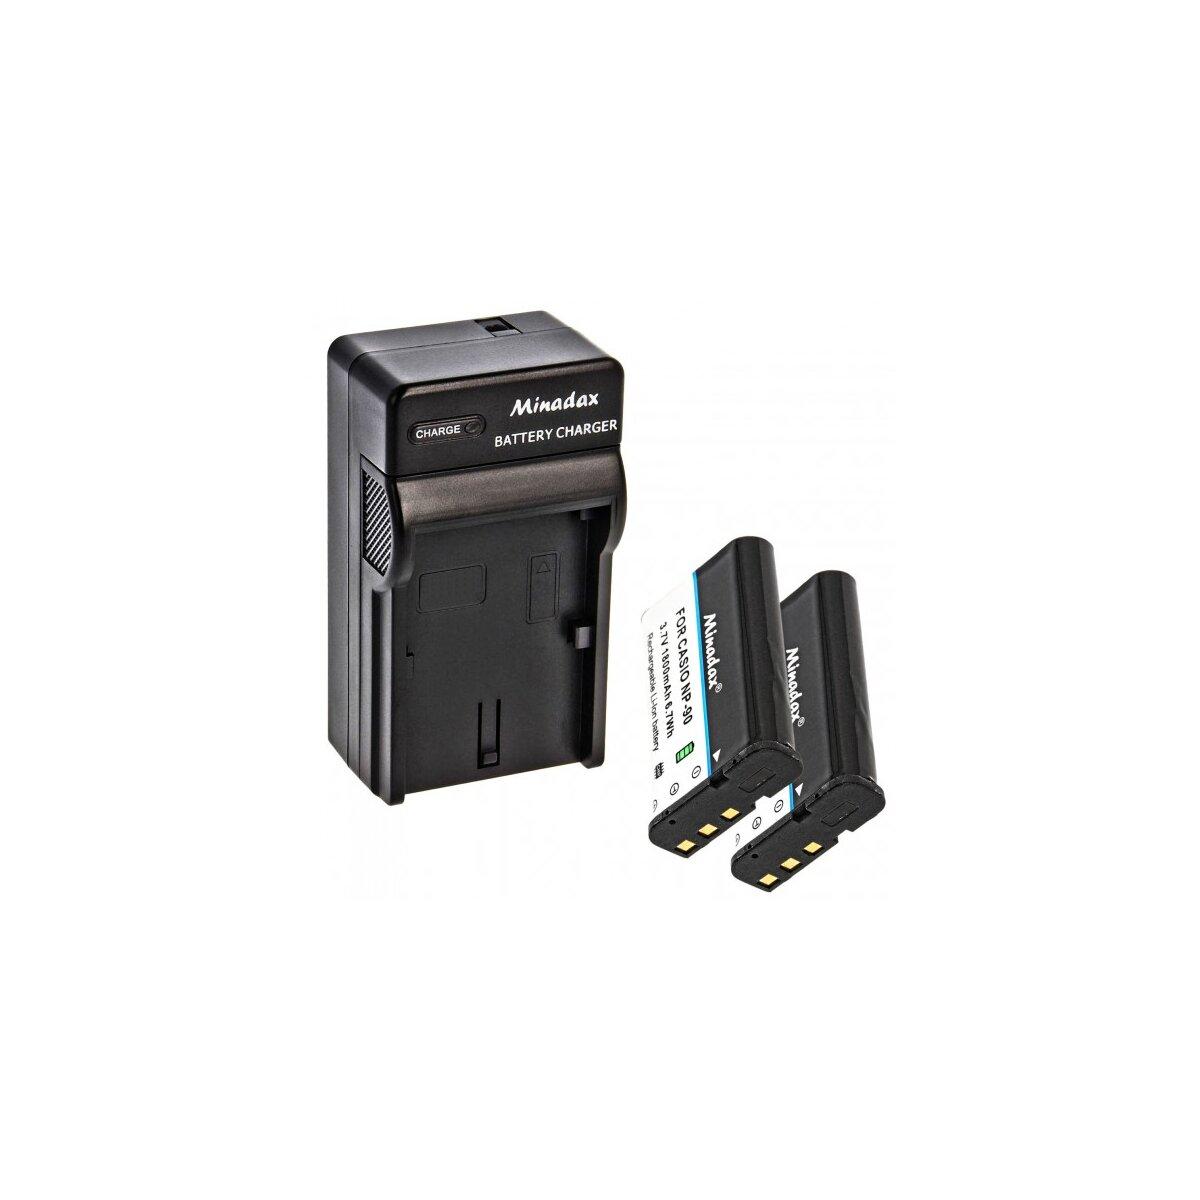 Minadax® Ladegerät 100% kompatibel mit Casio NP-90 inkl. Auto Ladekabel, Ladeschale austauschbar + 2x Akku Ersatz für NP-90